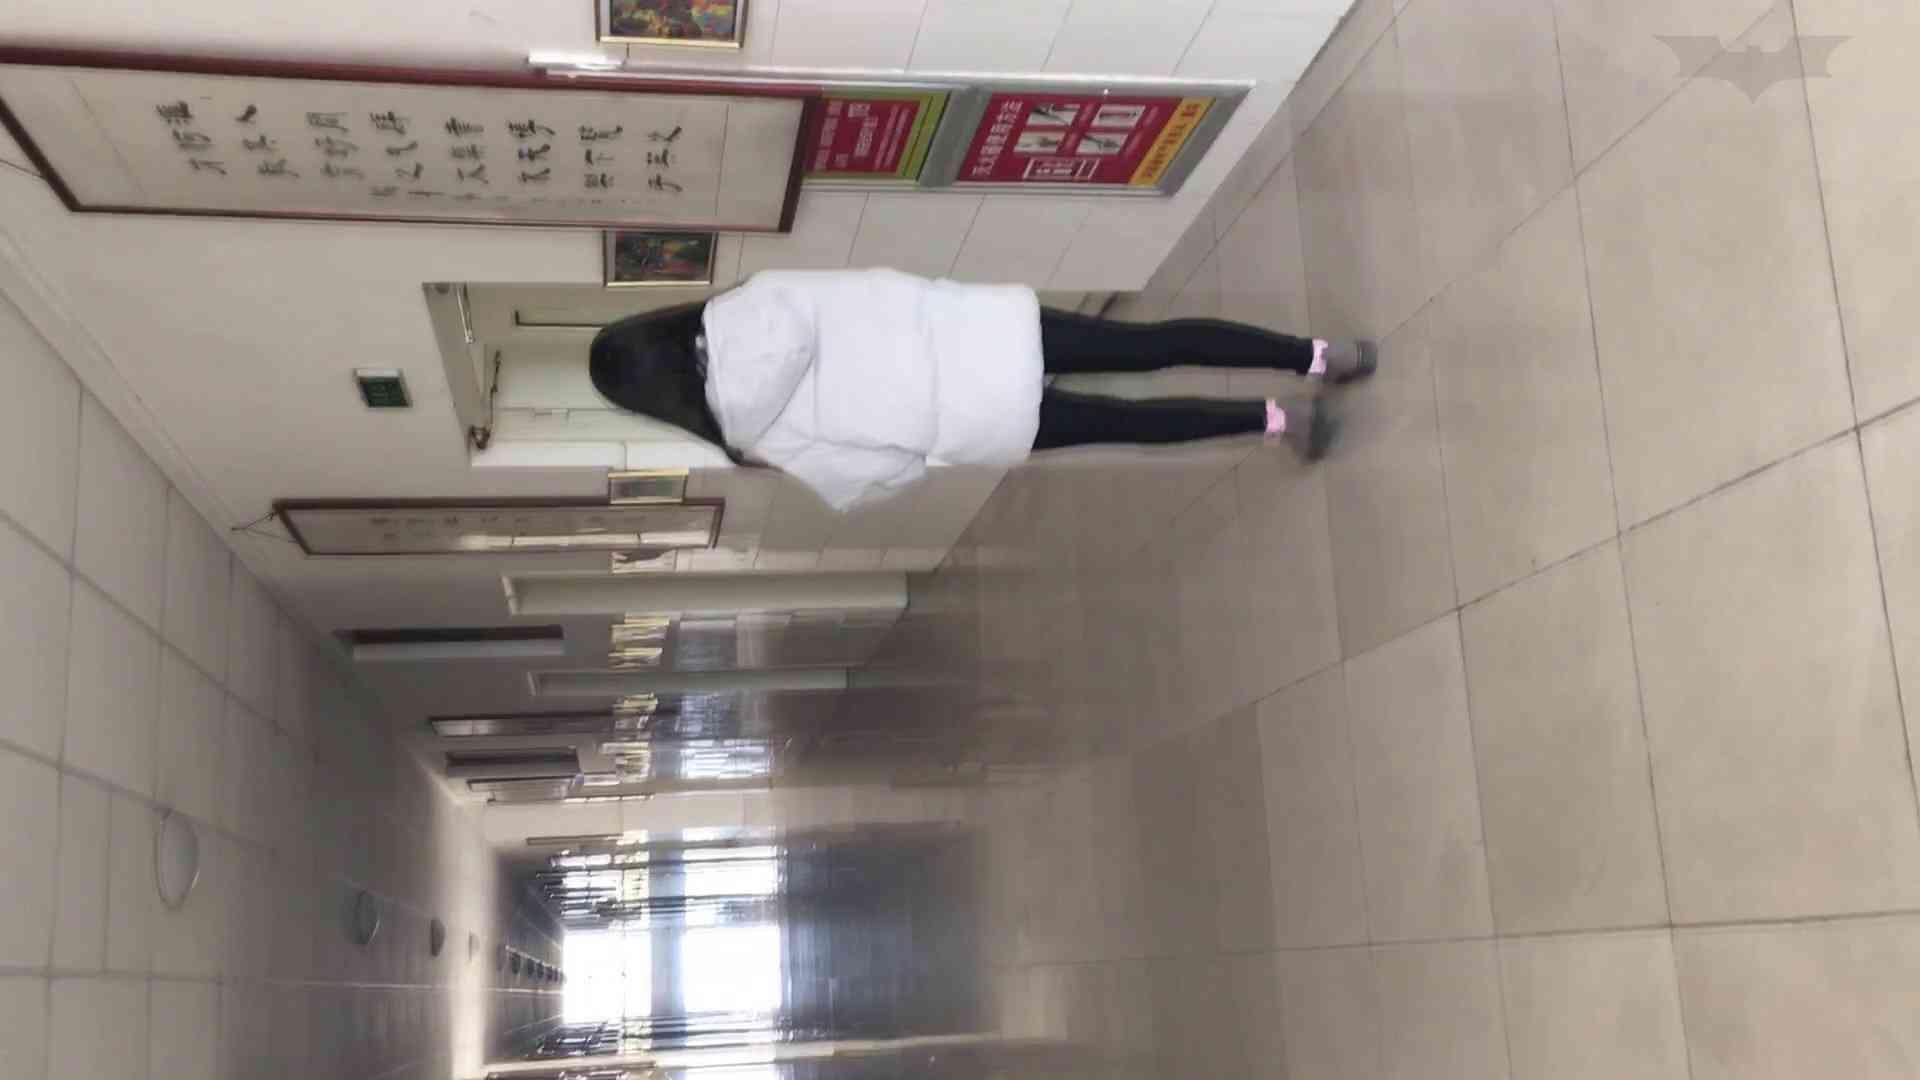 芸術大学ガチ潜入盗撮 JD盗撮 美女の洗面所の秘密 Vol.80 潜入 ヌード画像 57連発 21